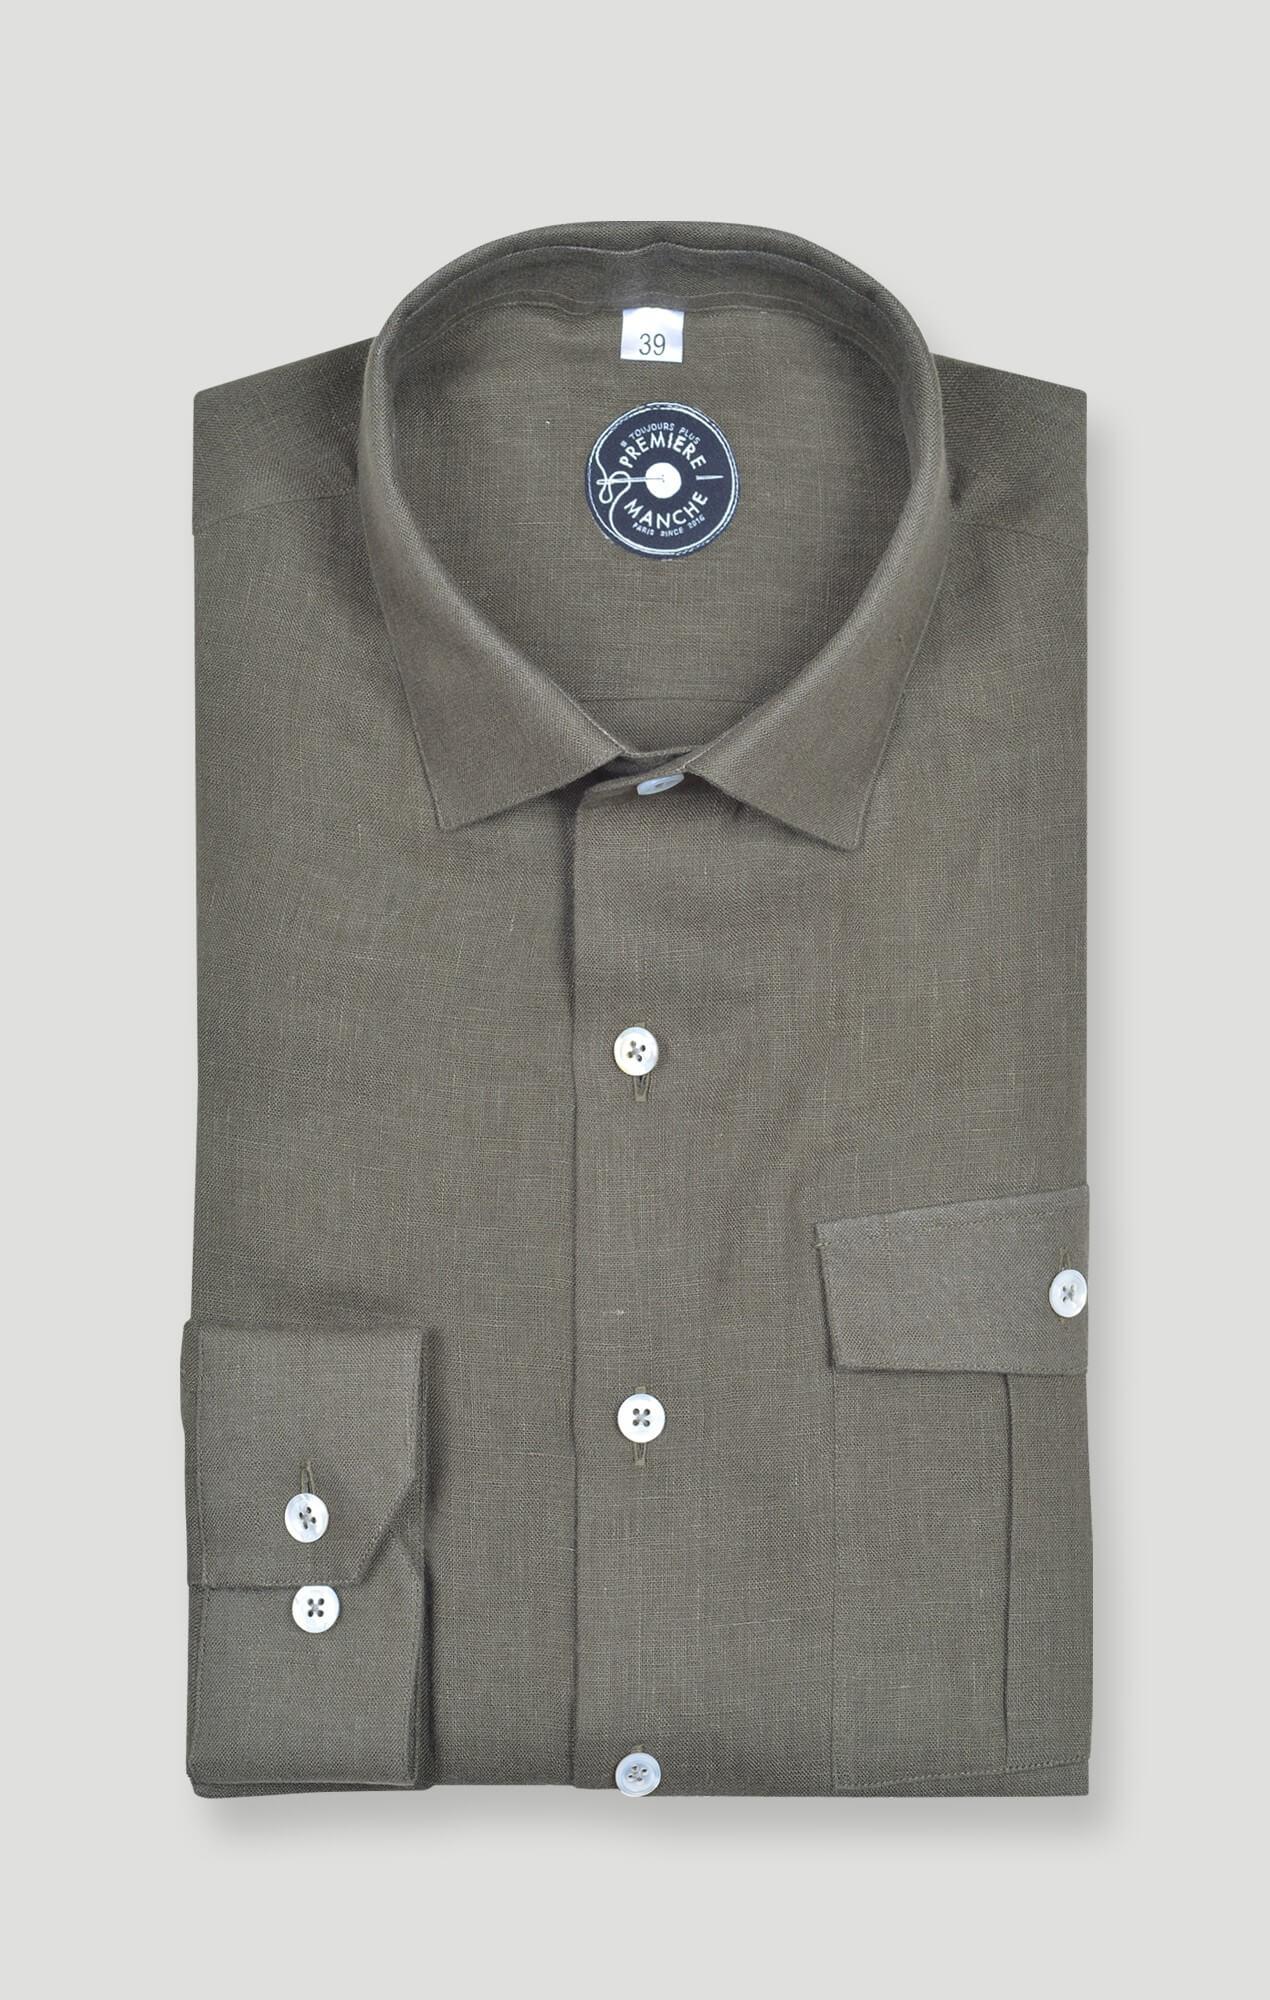 Kaki linen shirt